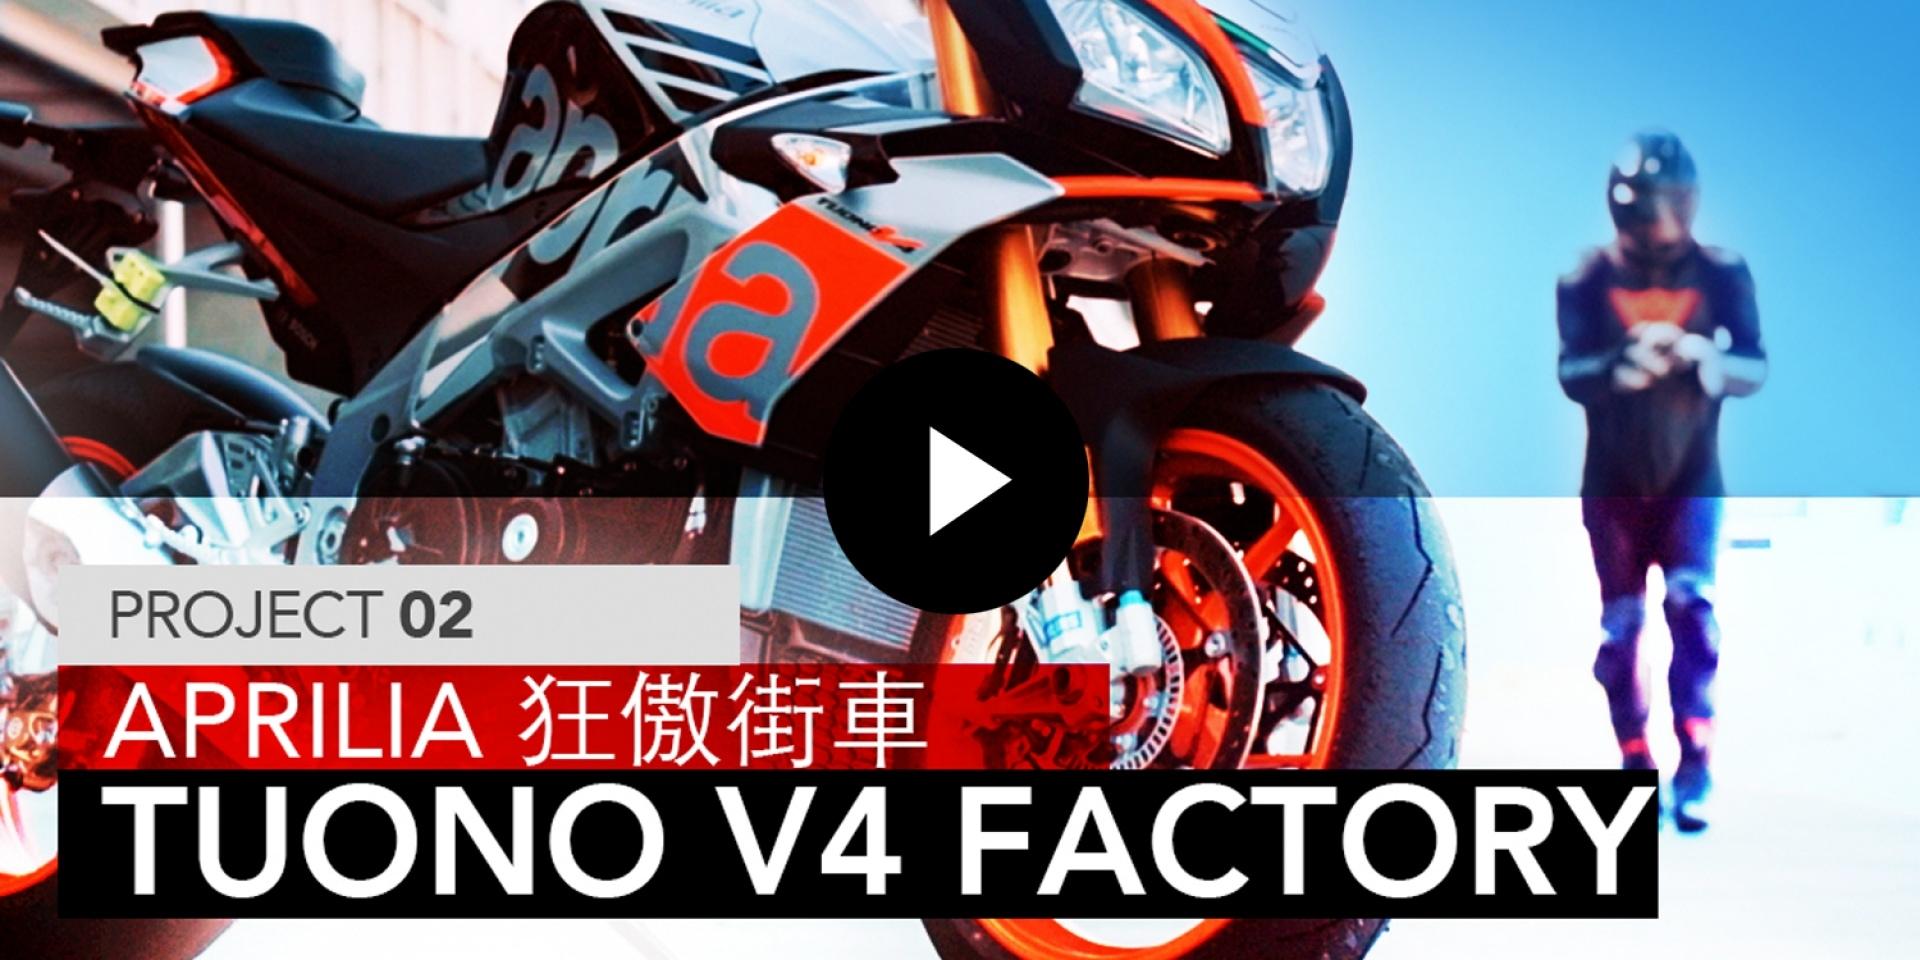 Aprilia 狂傲街車 2016 Tuono 1100 V4 Factory / PROJECT 02